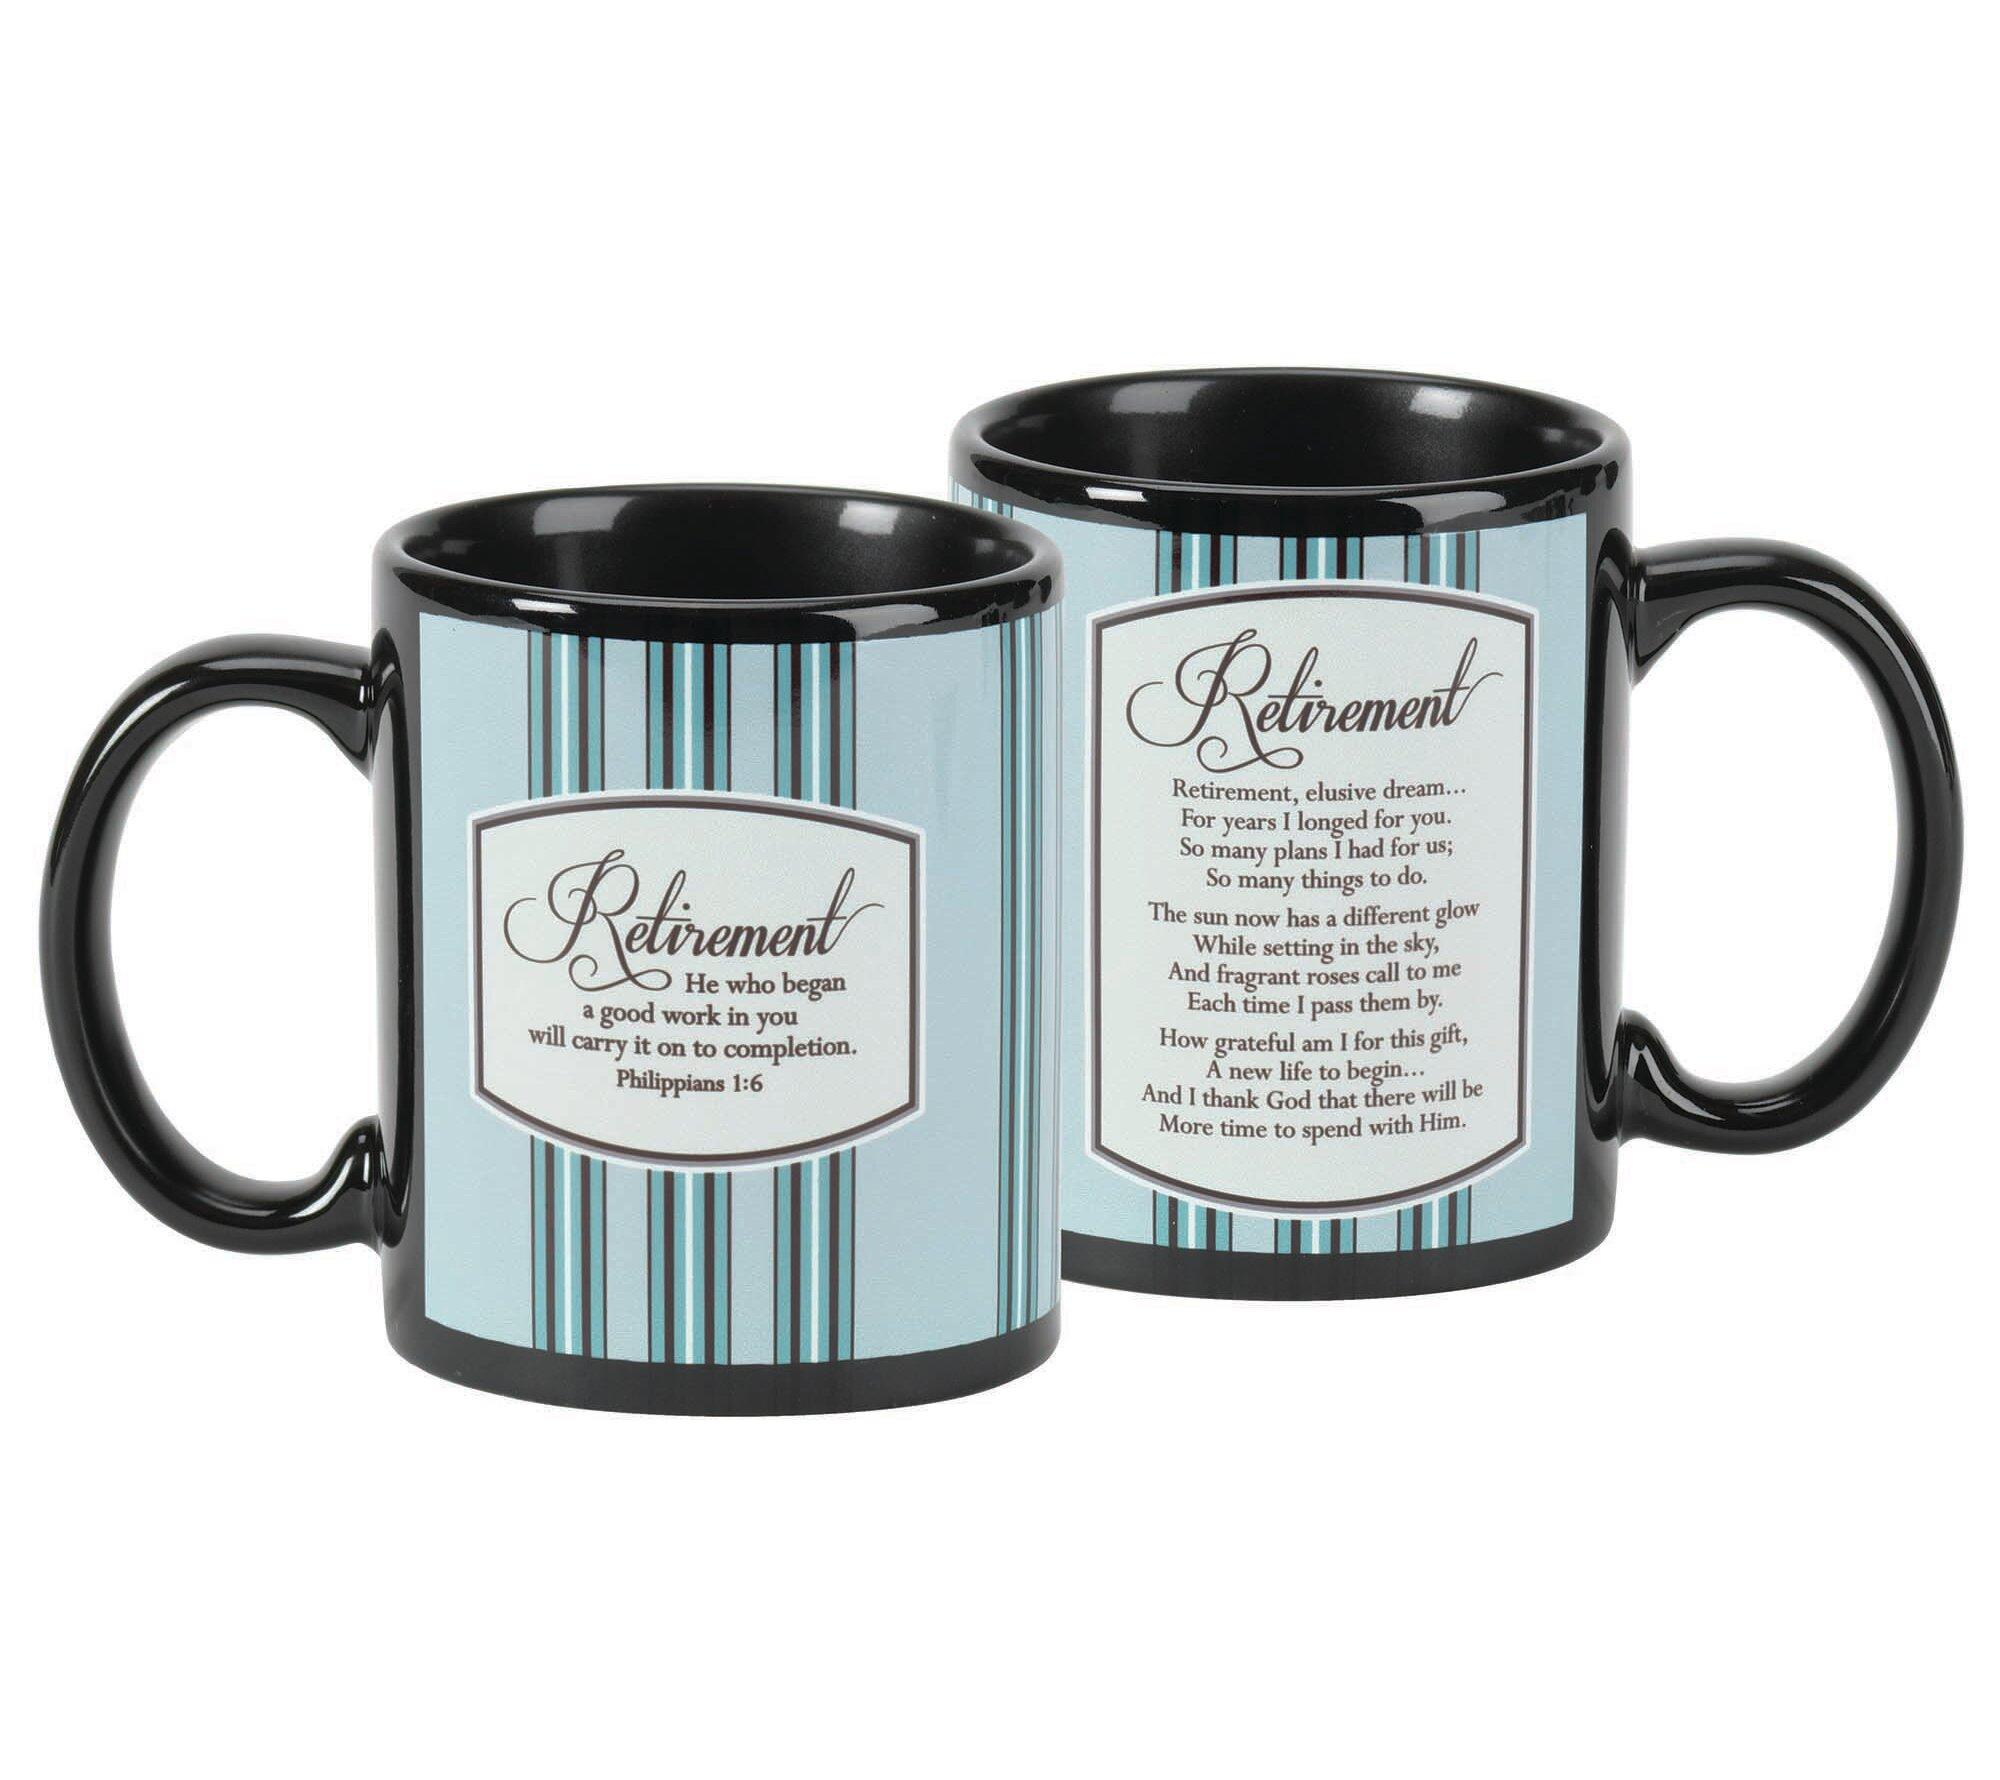 Work For God Retirement Benefits Great Ceramic Coffee Tea Mug Cup